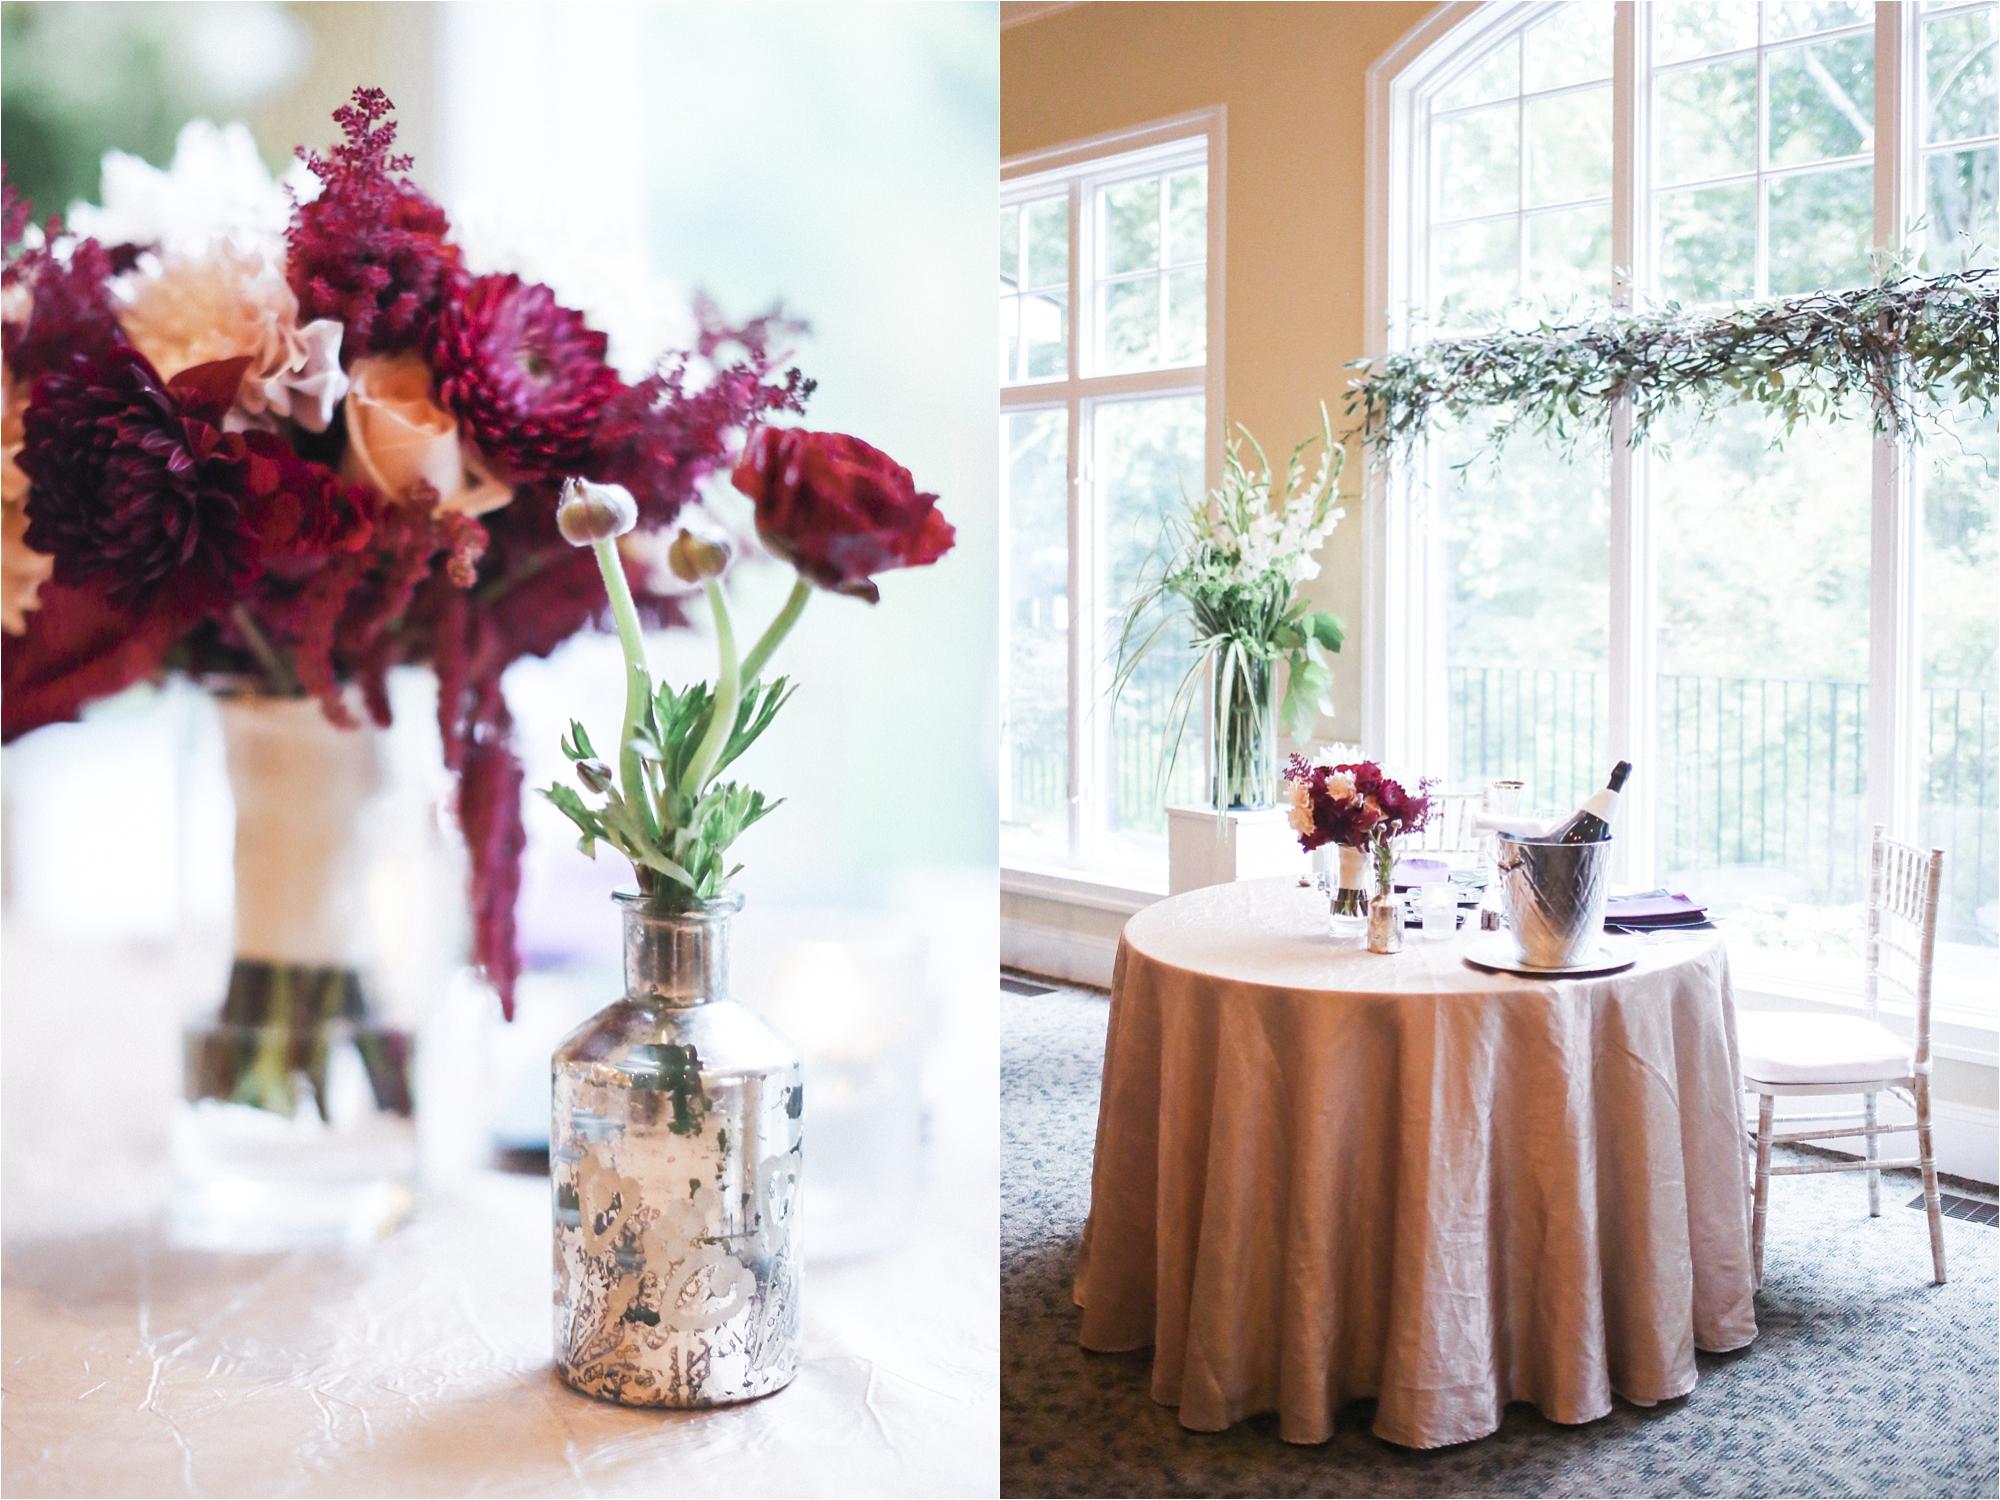 stephanie-yonce-photography-richmond-virginia-bohemian-outdoor-wedding-photo_0037.jpg